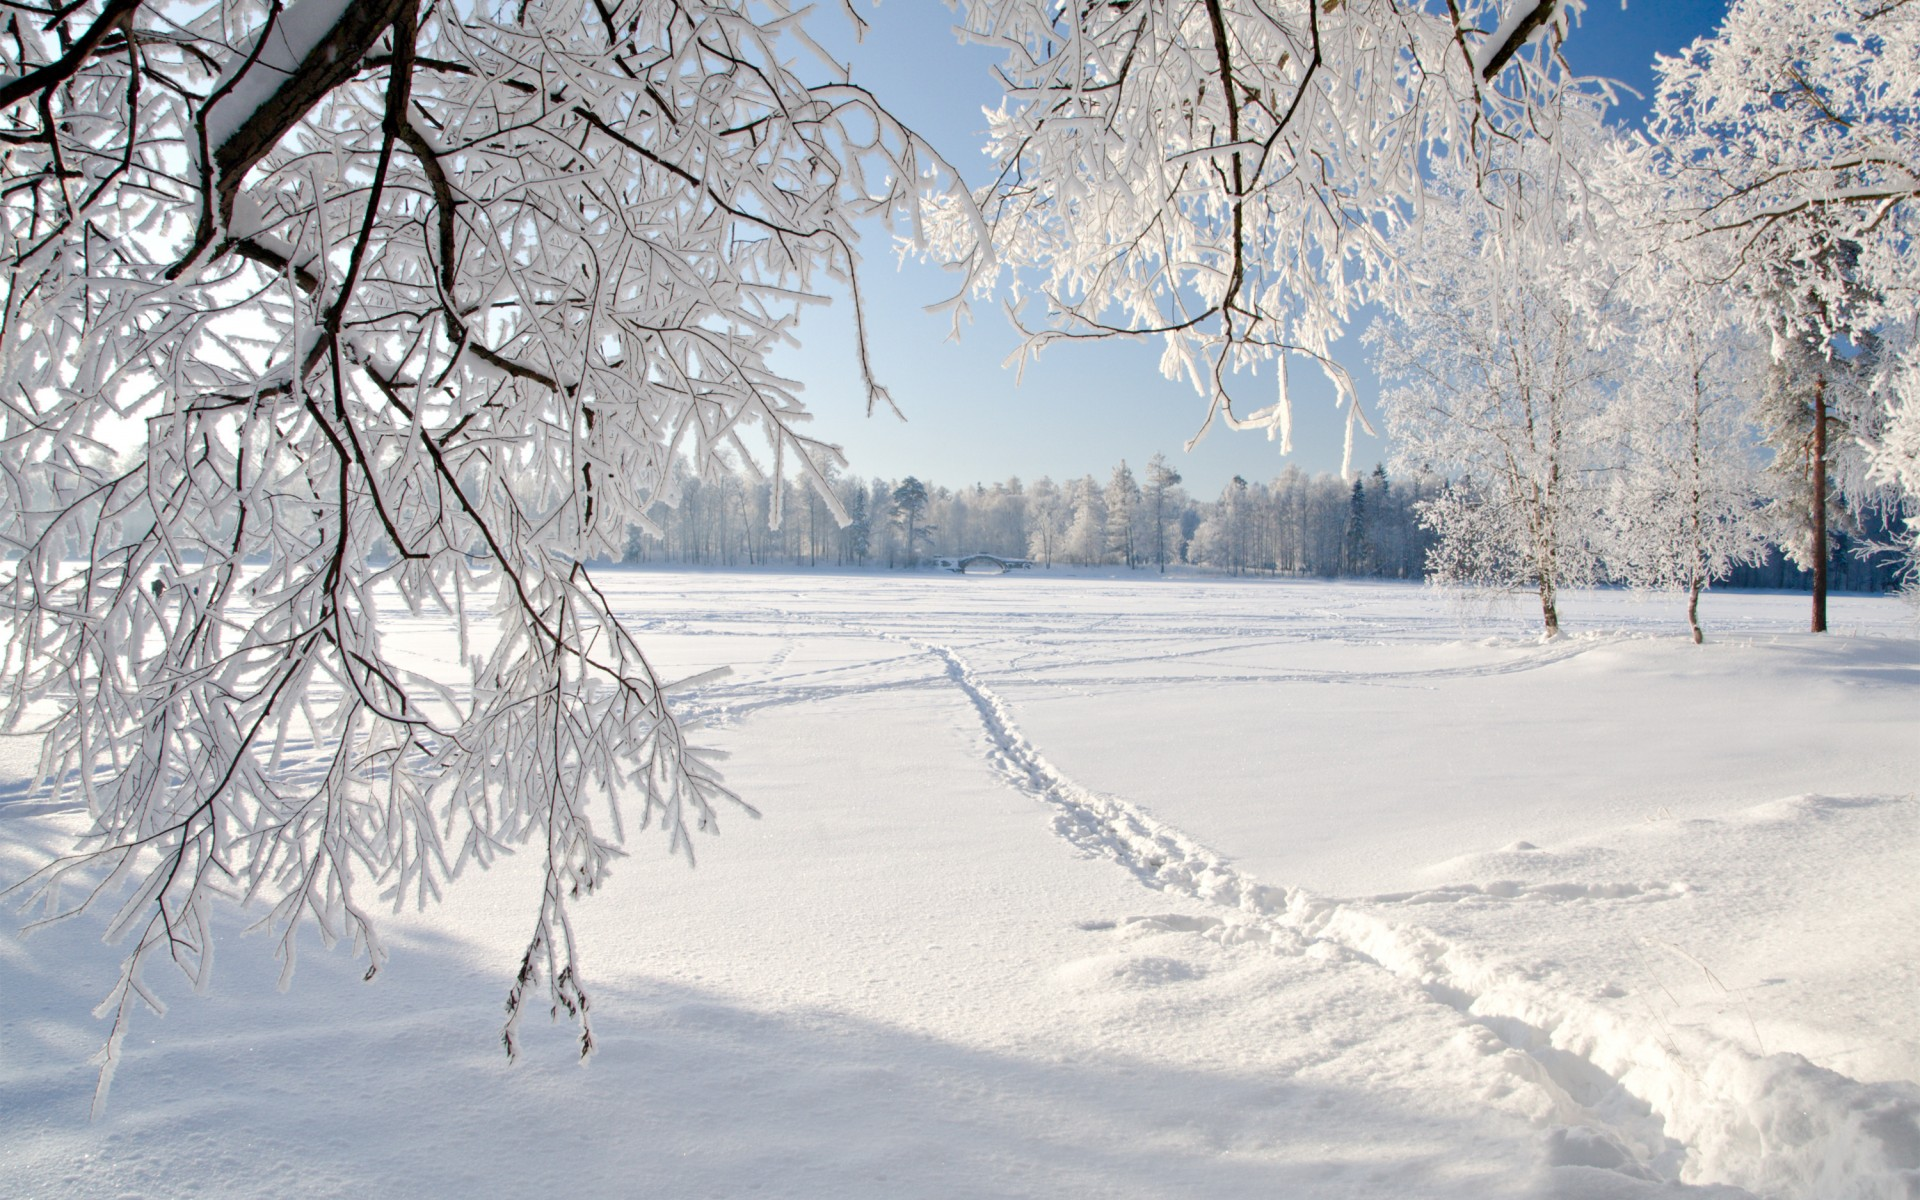 Snowy Trees Winter HD Wallpaper 1920x1200